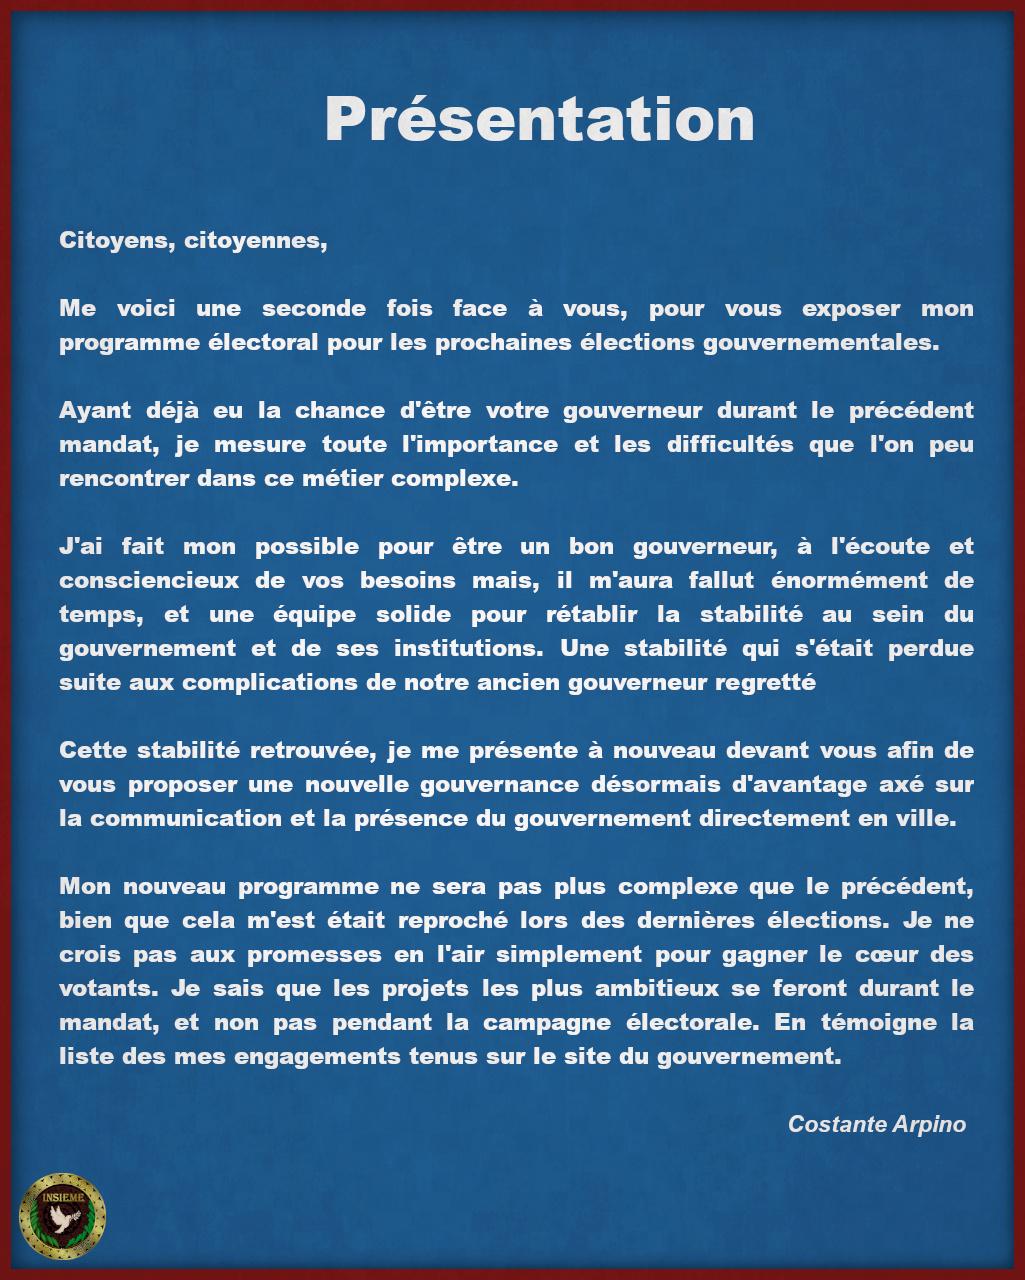 Programme Électoral - Costante Arpino Page211